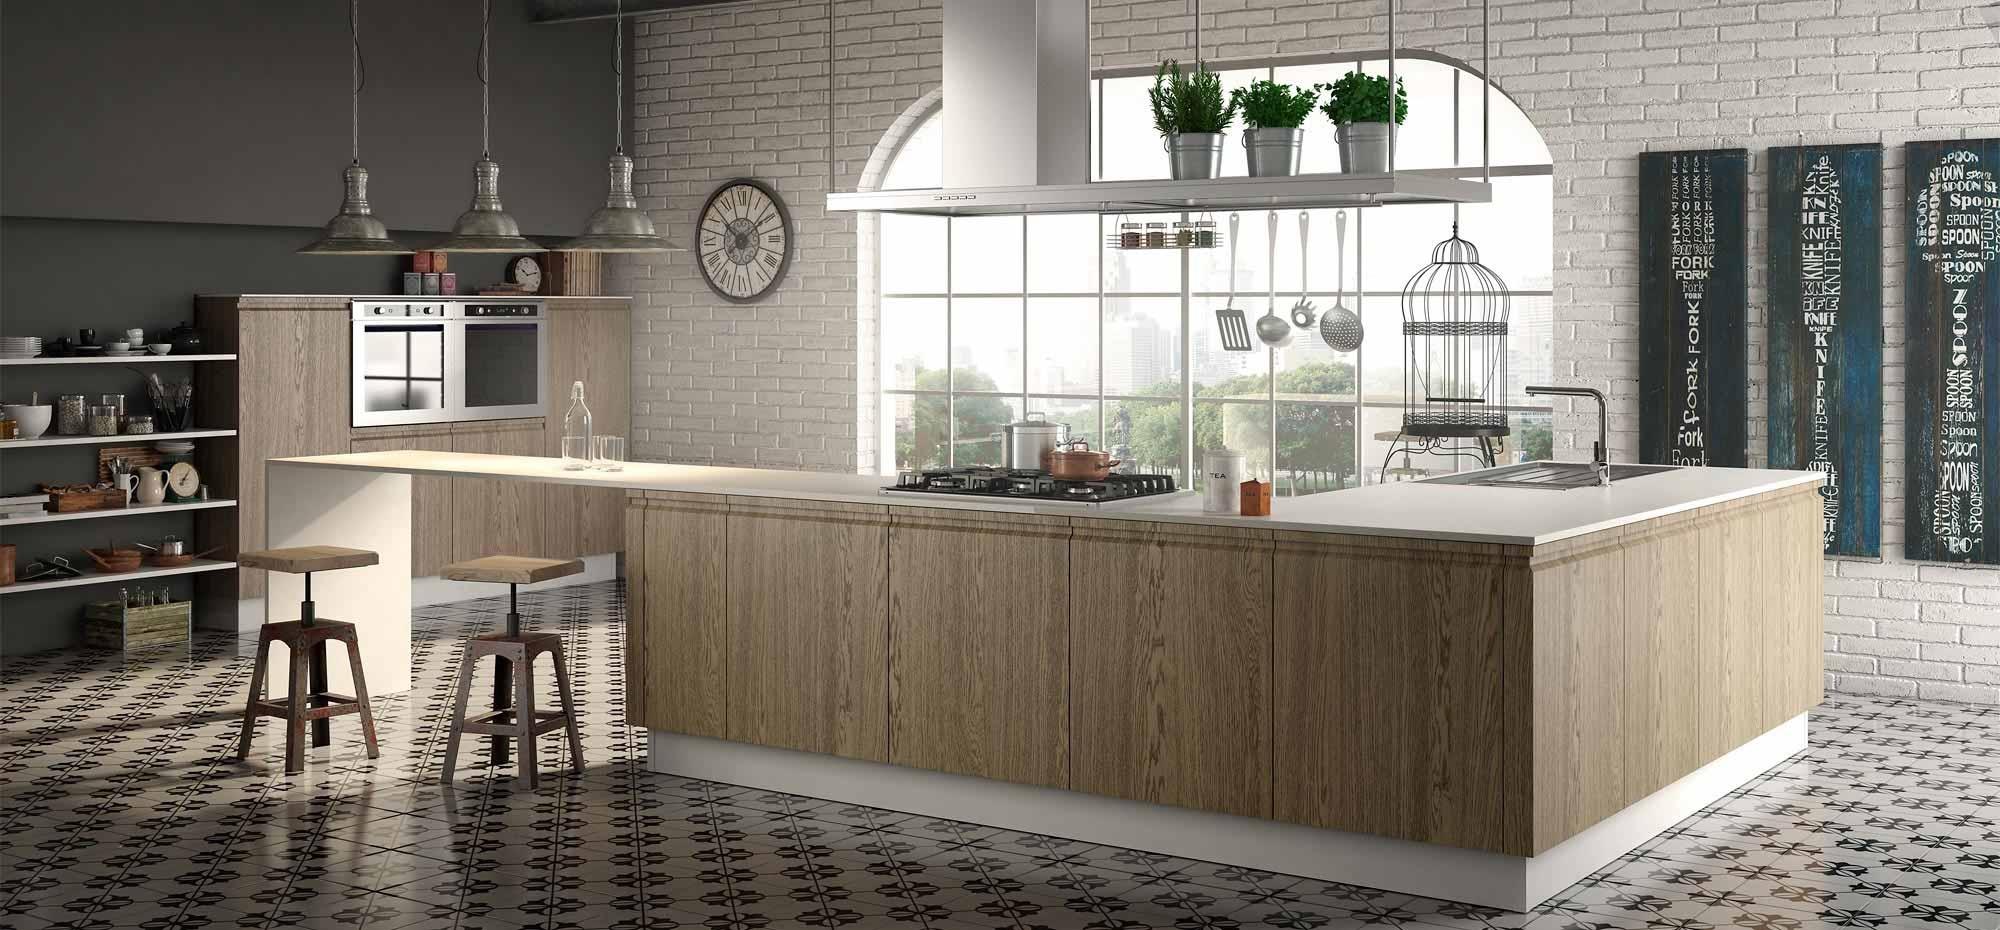 Best Marche Di Cucine Italiane Migliori Pictures - Ideas & Design ...